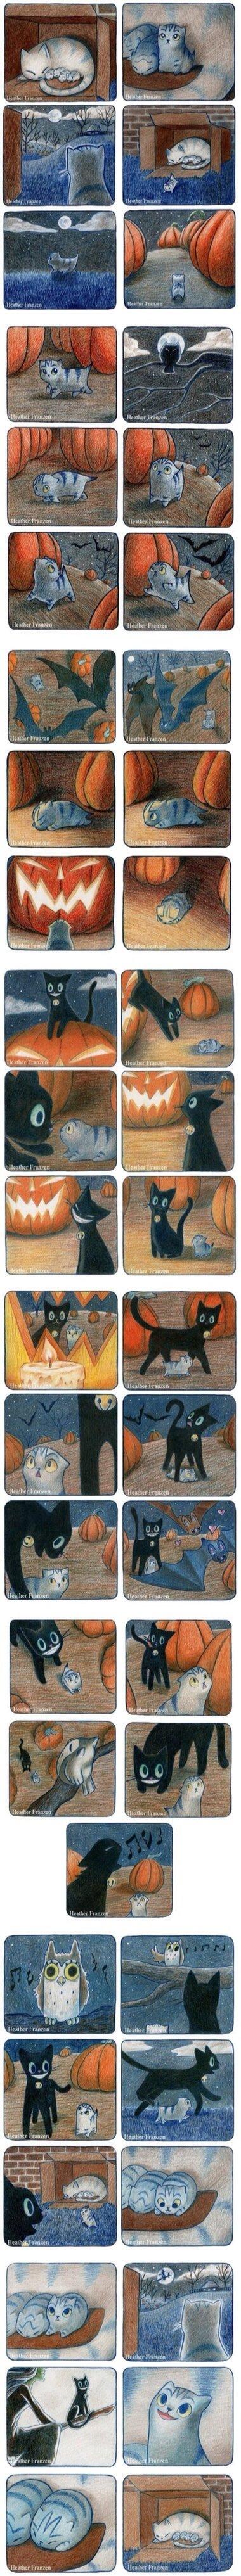 Cats.. . Urghey ! trae, iditor,' eihter . rascit